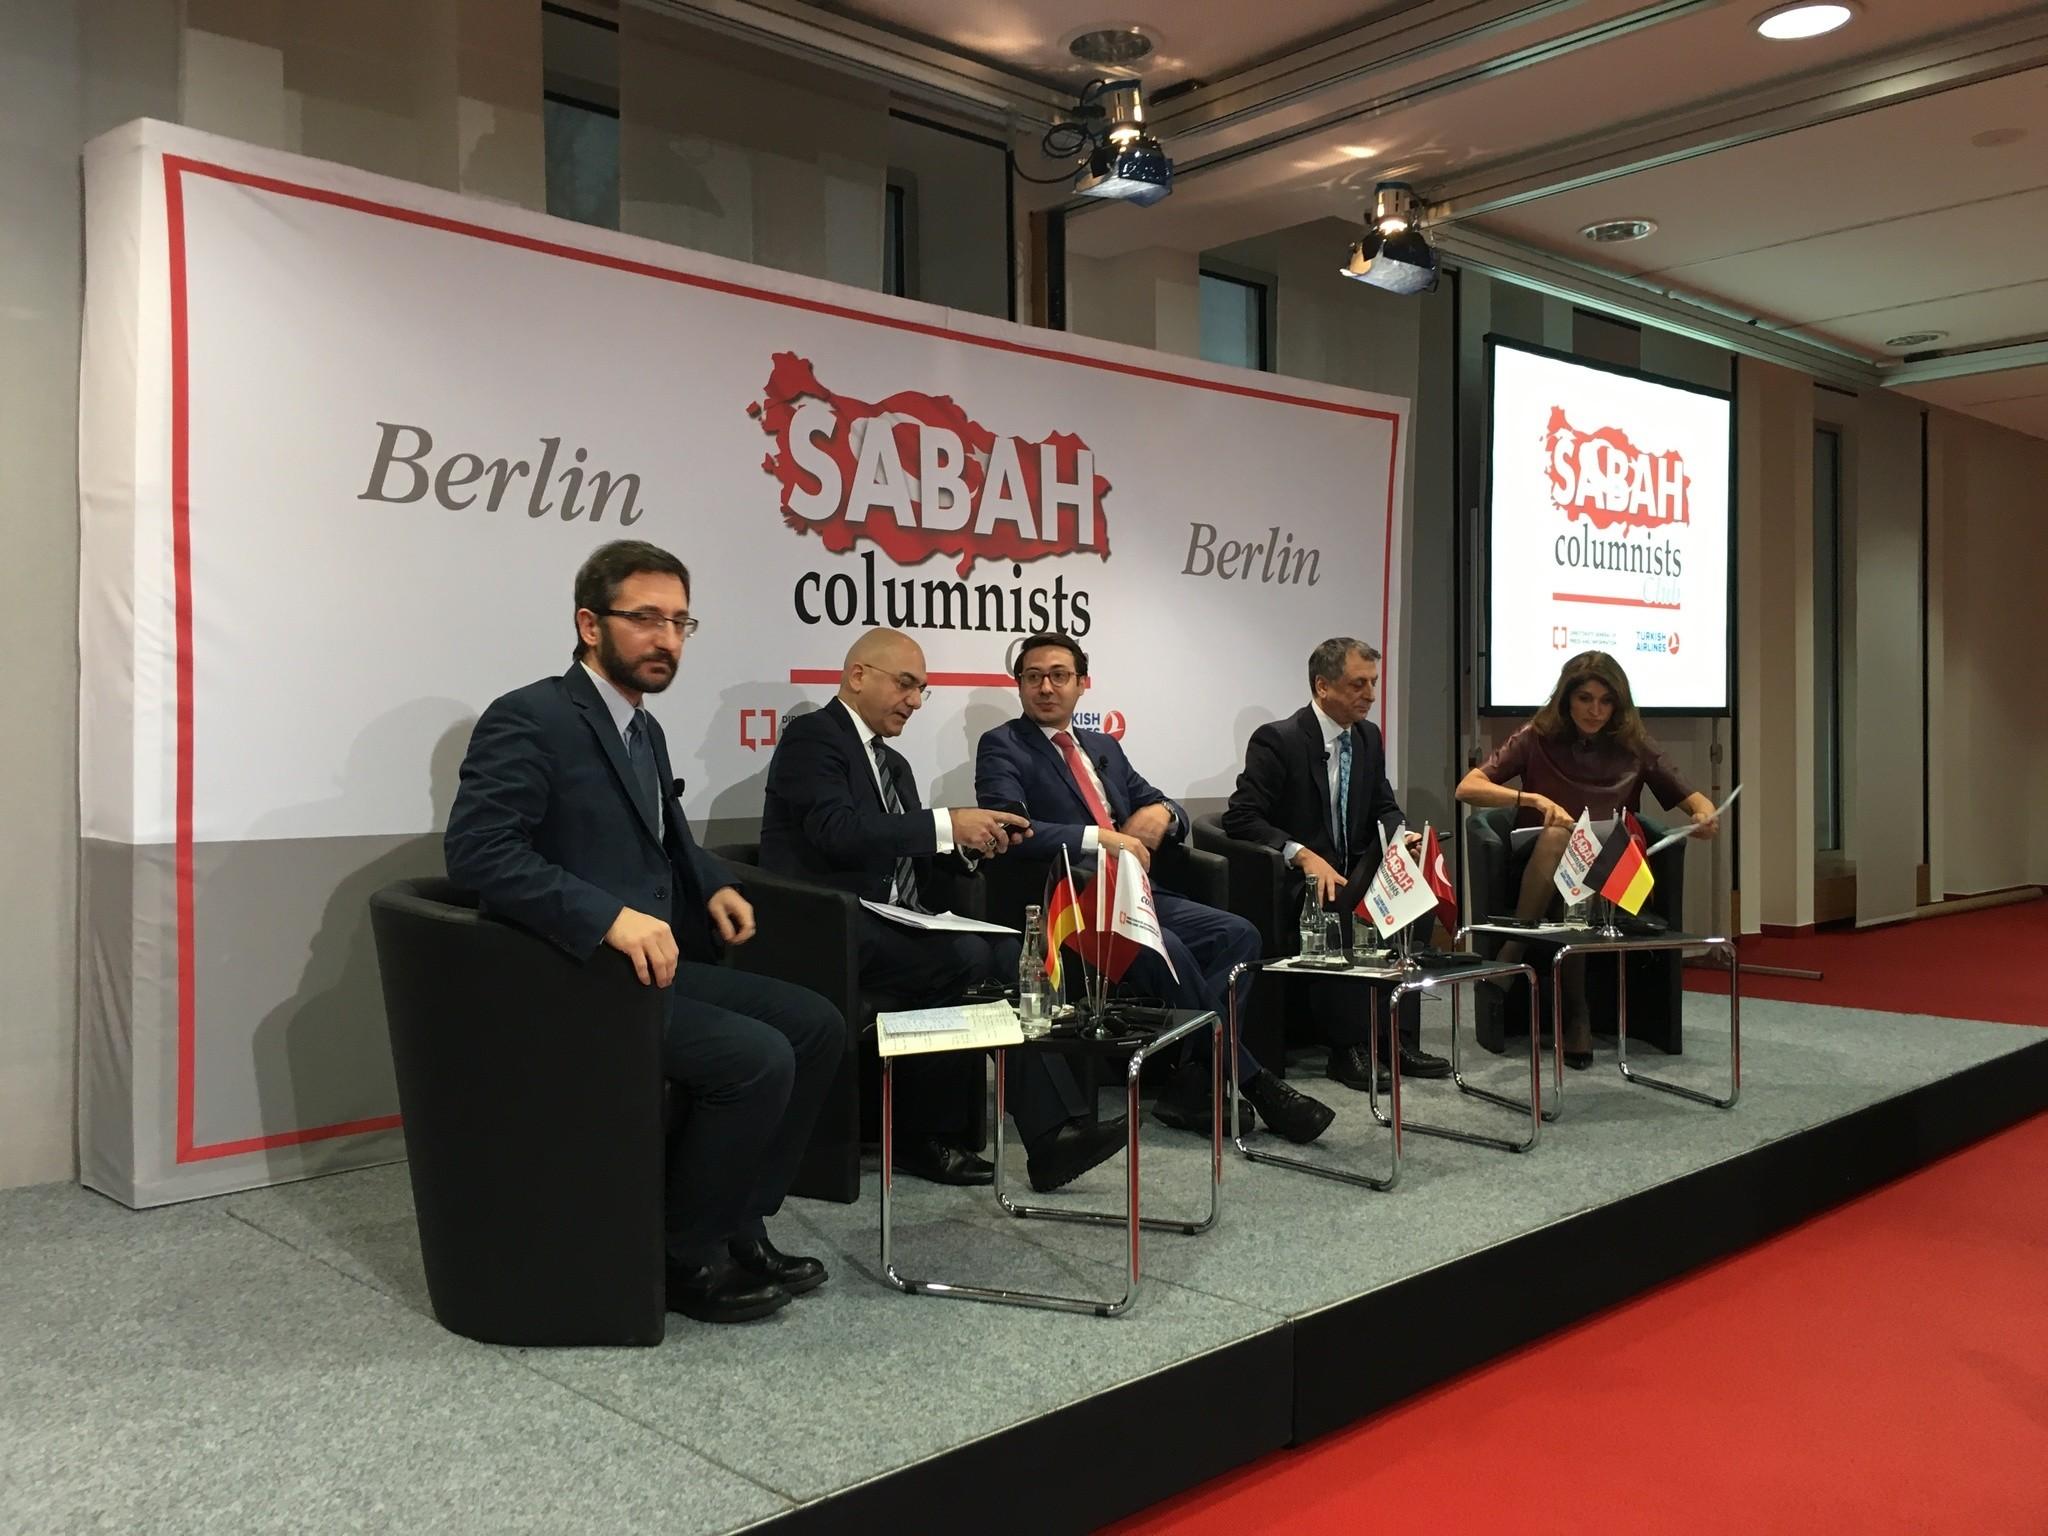 From L-R: Assoc. Prof. F. Altun, Former EP Ozan Ceyhun,  DS Editor-in-Chief Serdar Karagu00f6z, columnists Mahmut u00d6vu00fcr & u015eelale Kadak (Photo: @kaanelbir)